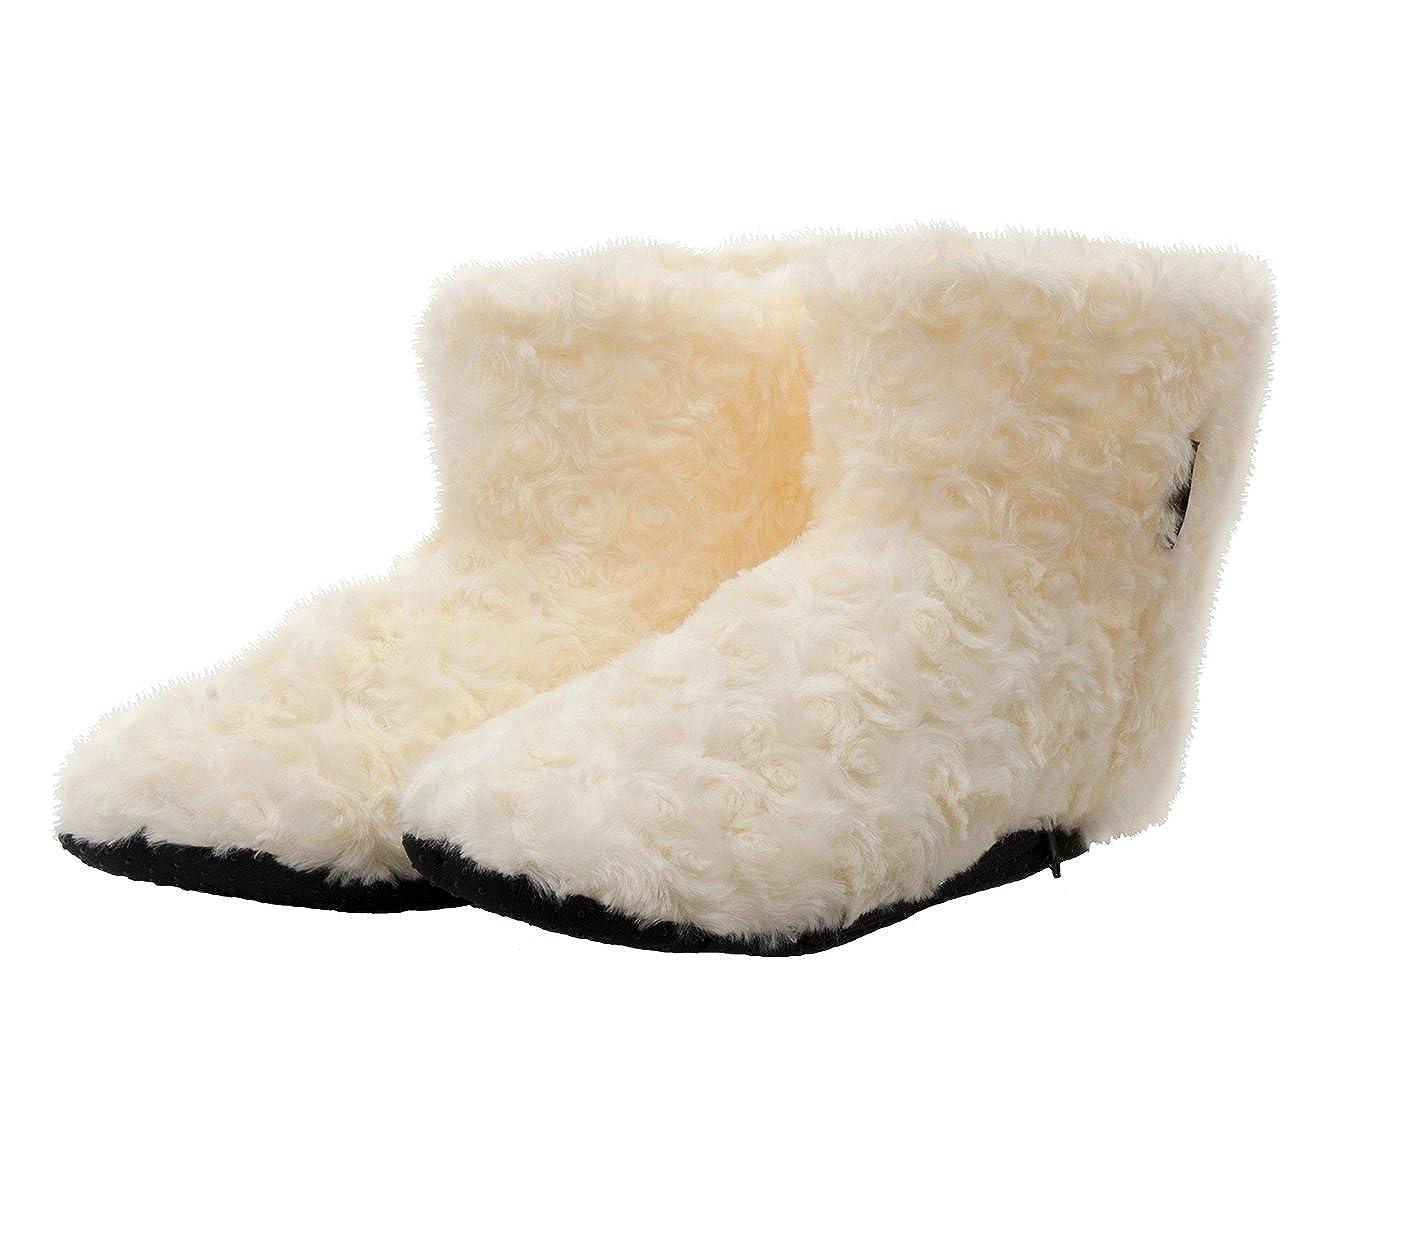 Warmawear Dual Fuel Battery Heated Indoor Slipper Boots